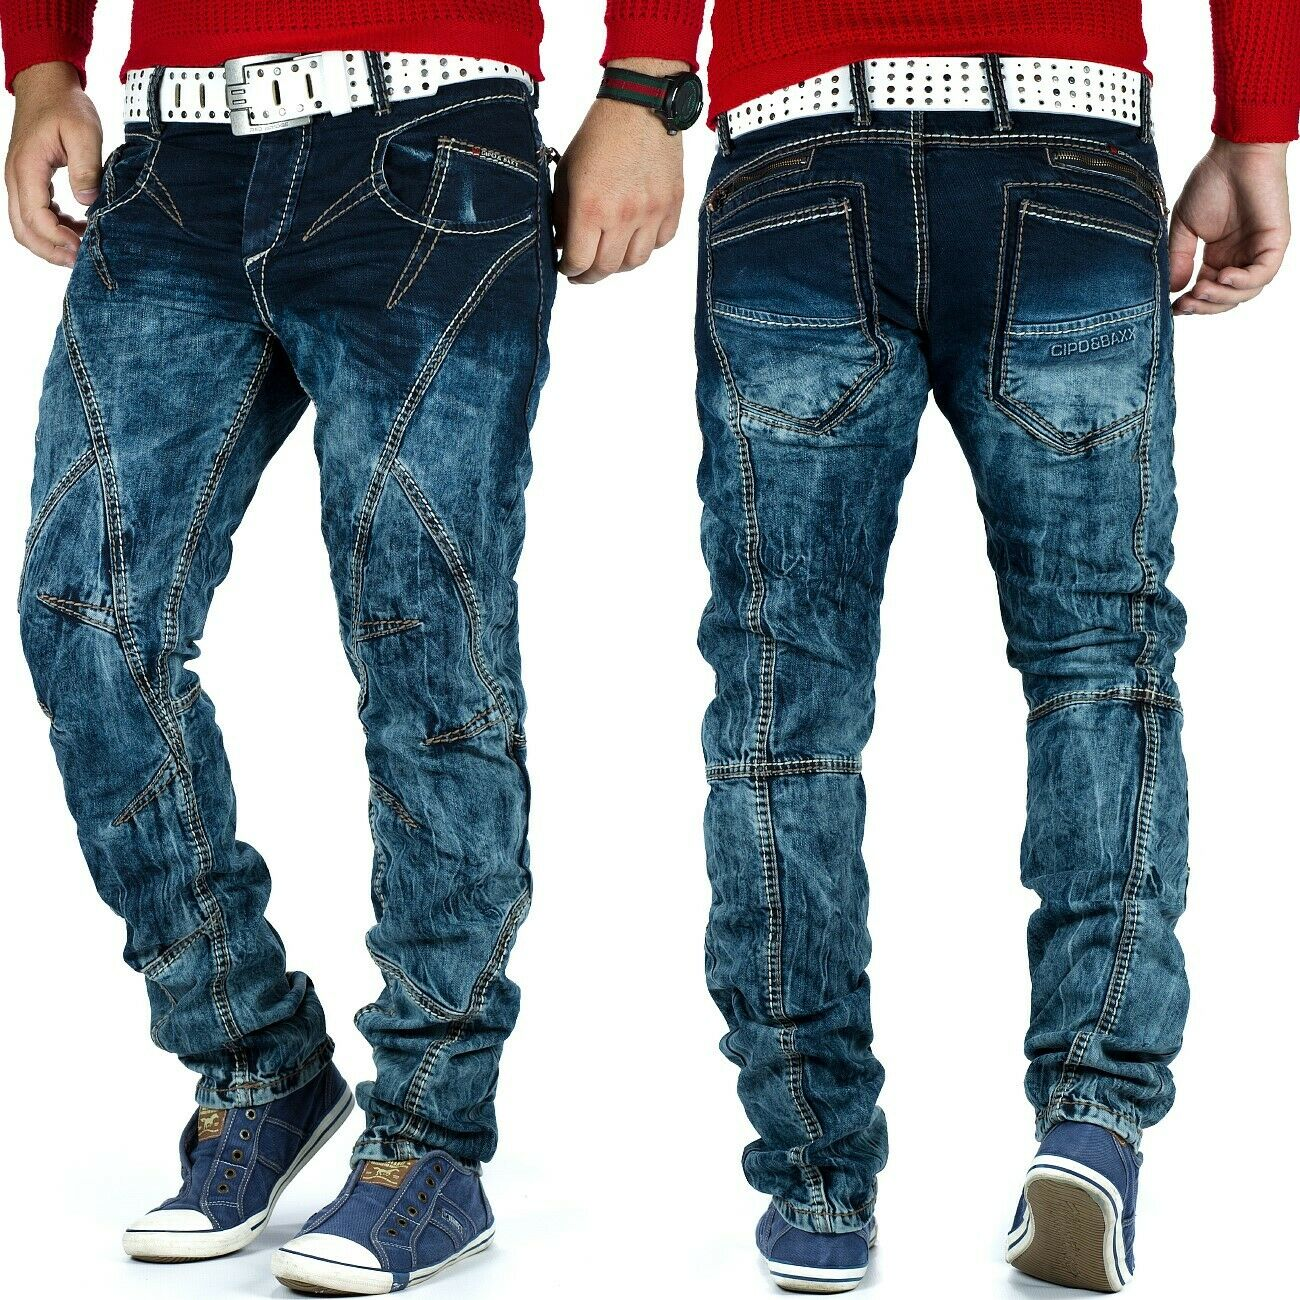 Cipo & Baxx Herren Regular Fit Jeans Denim Hose Streetwear Streetwear Streetwear Freizeit Dicke Naht 83b8e3